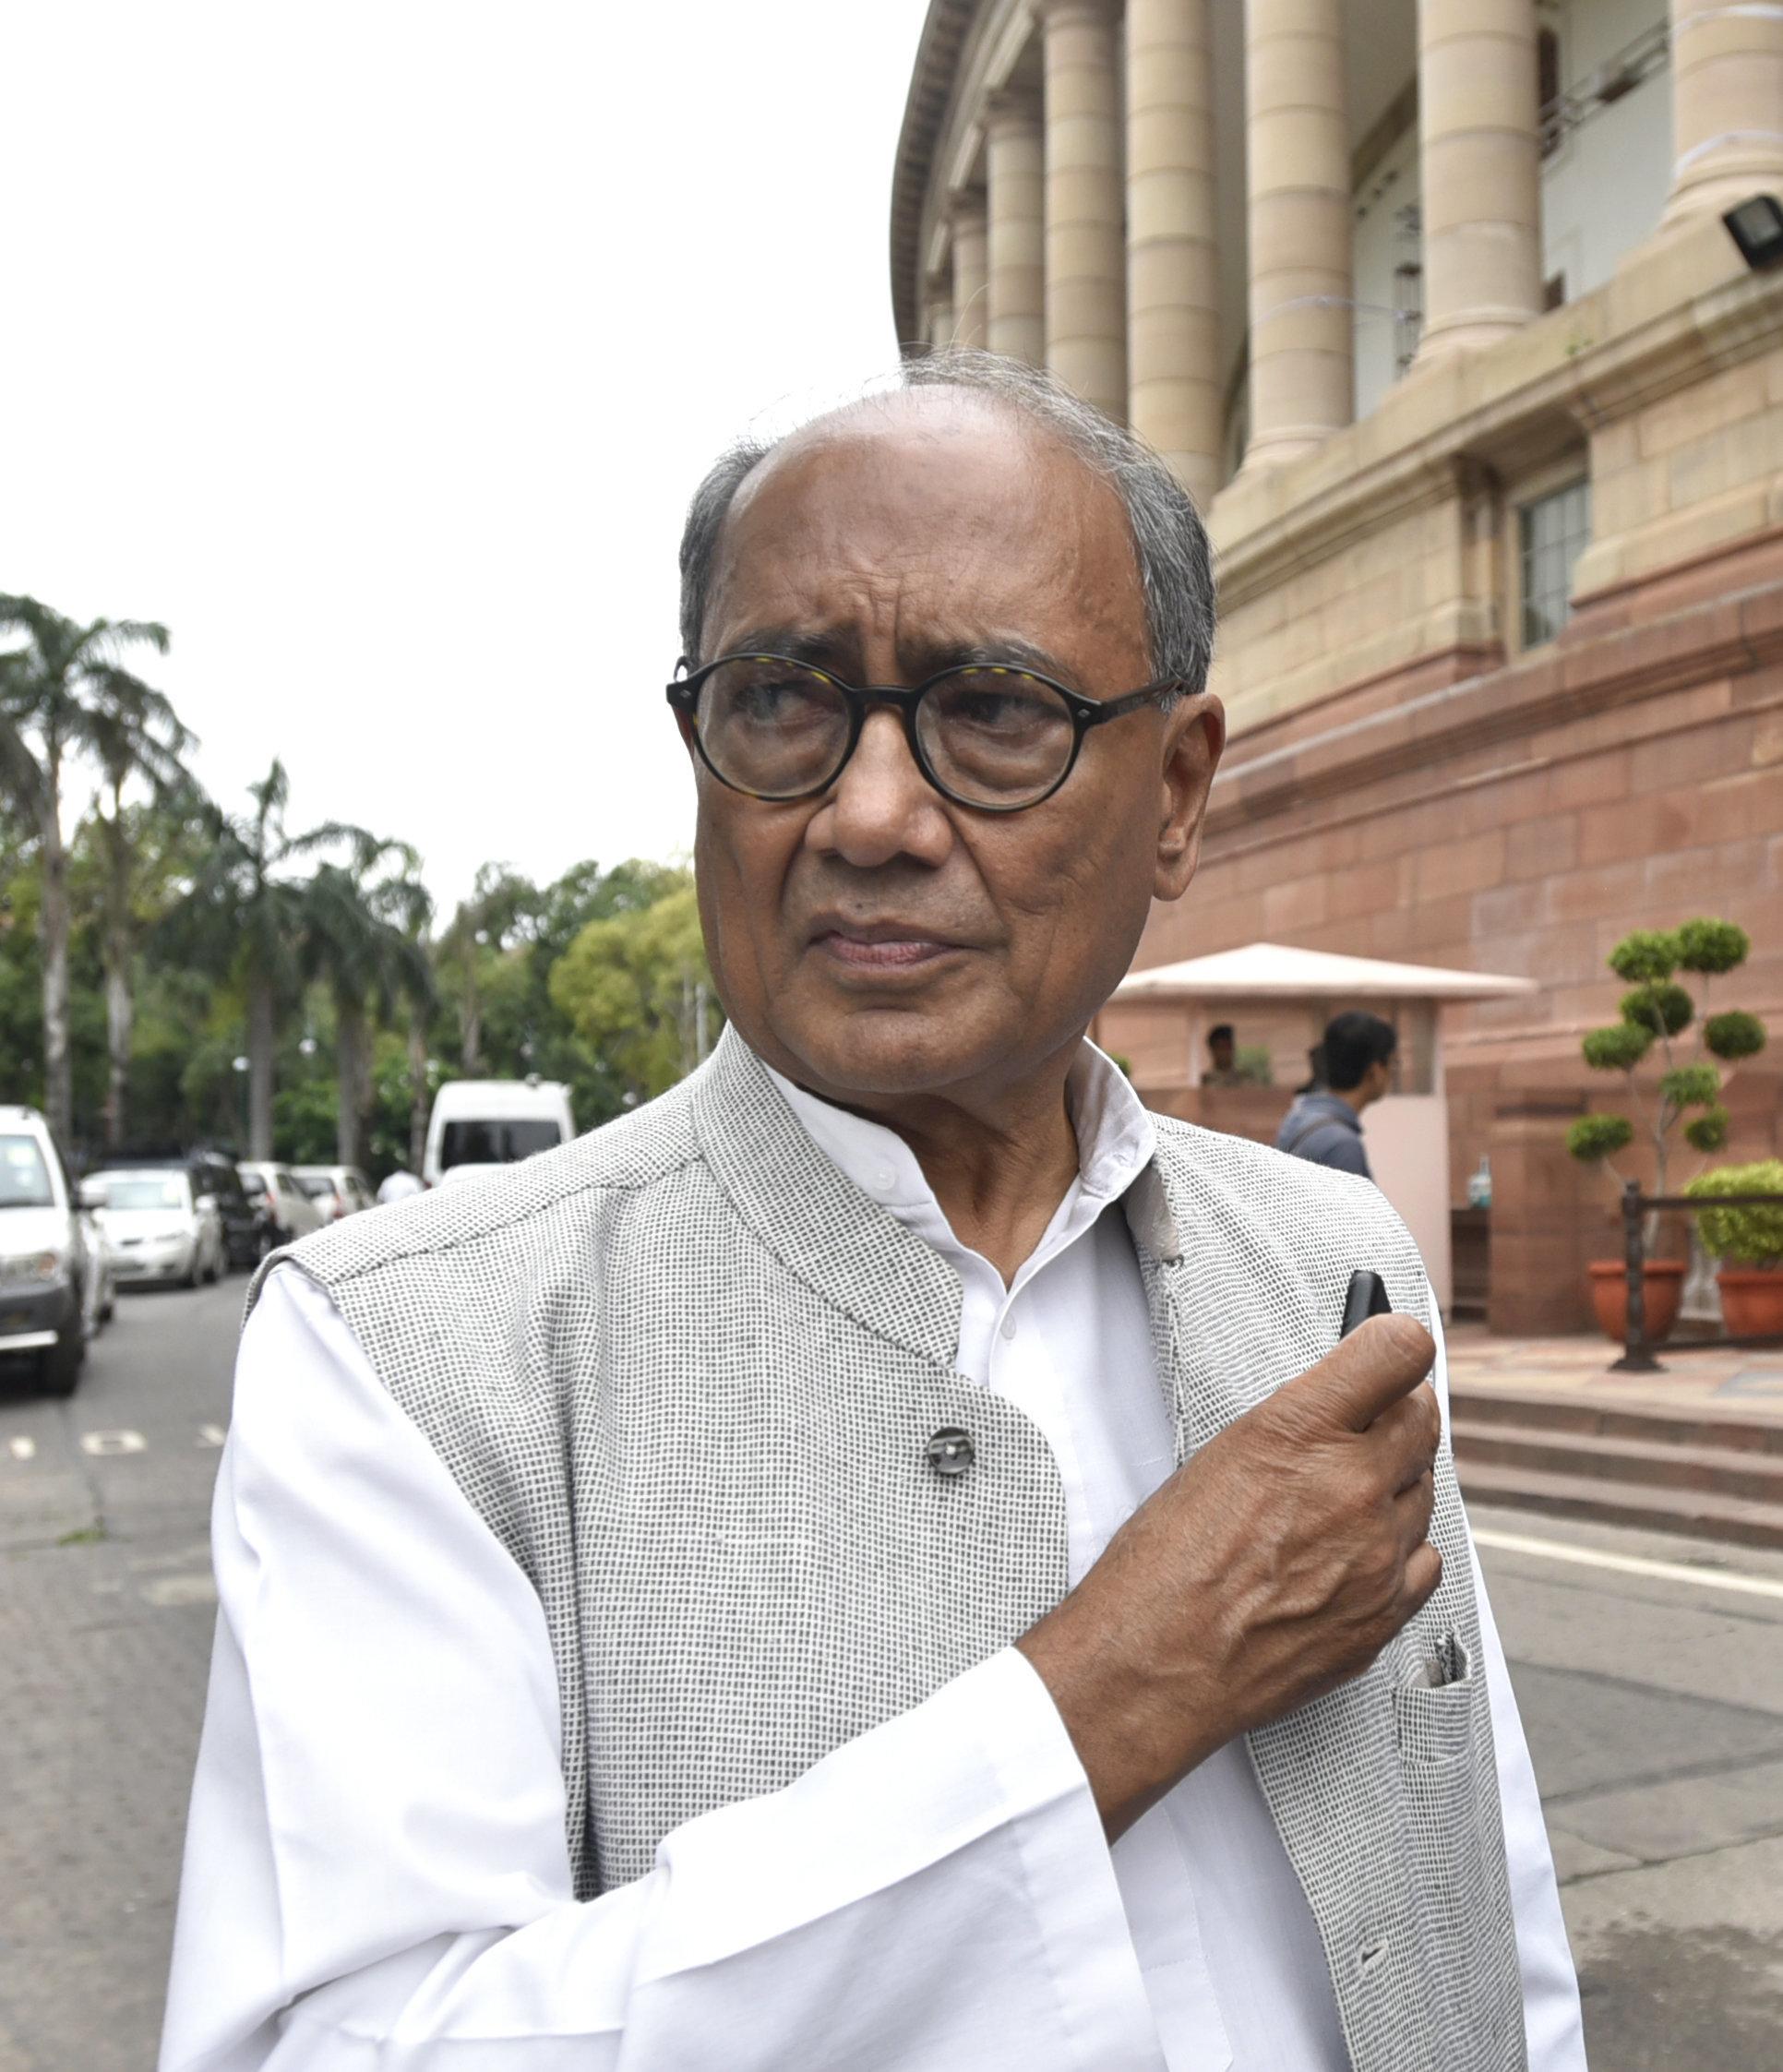 'File A Case Against Me': Digvijaya Singh Dares PM Modi After Pulwama